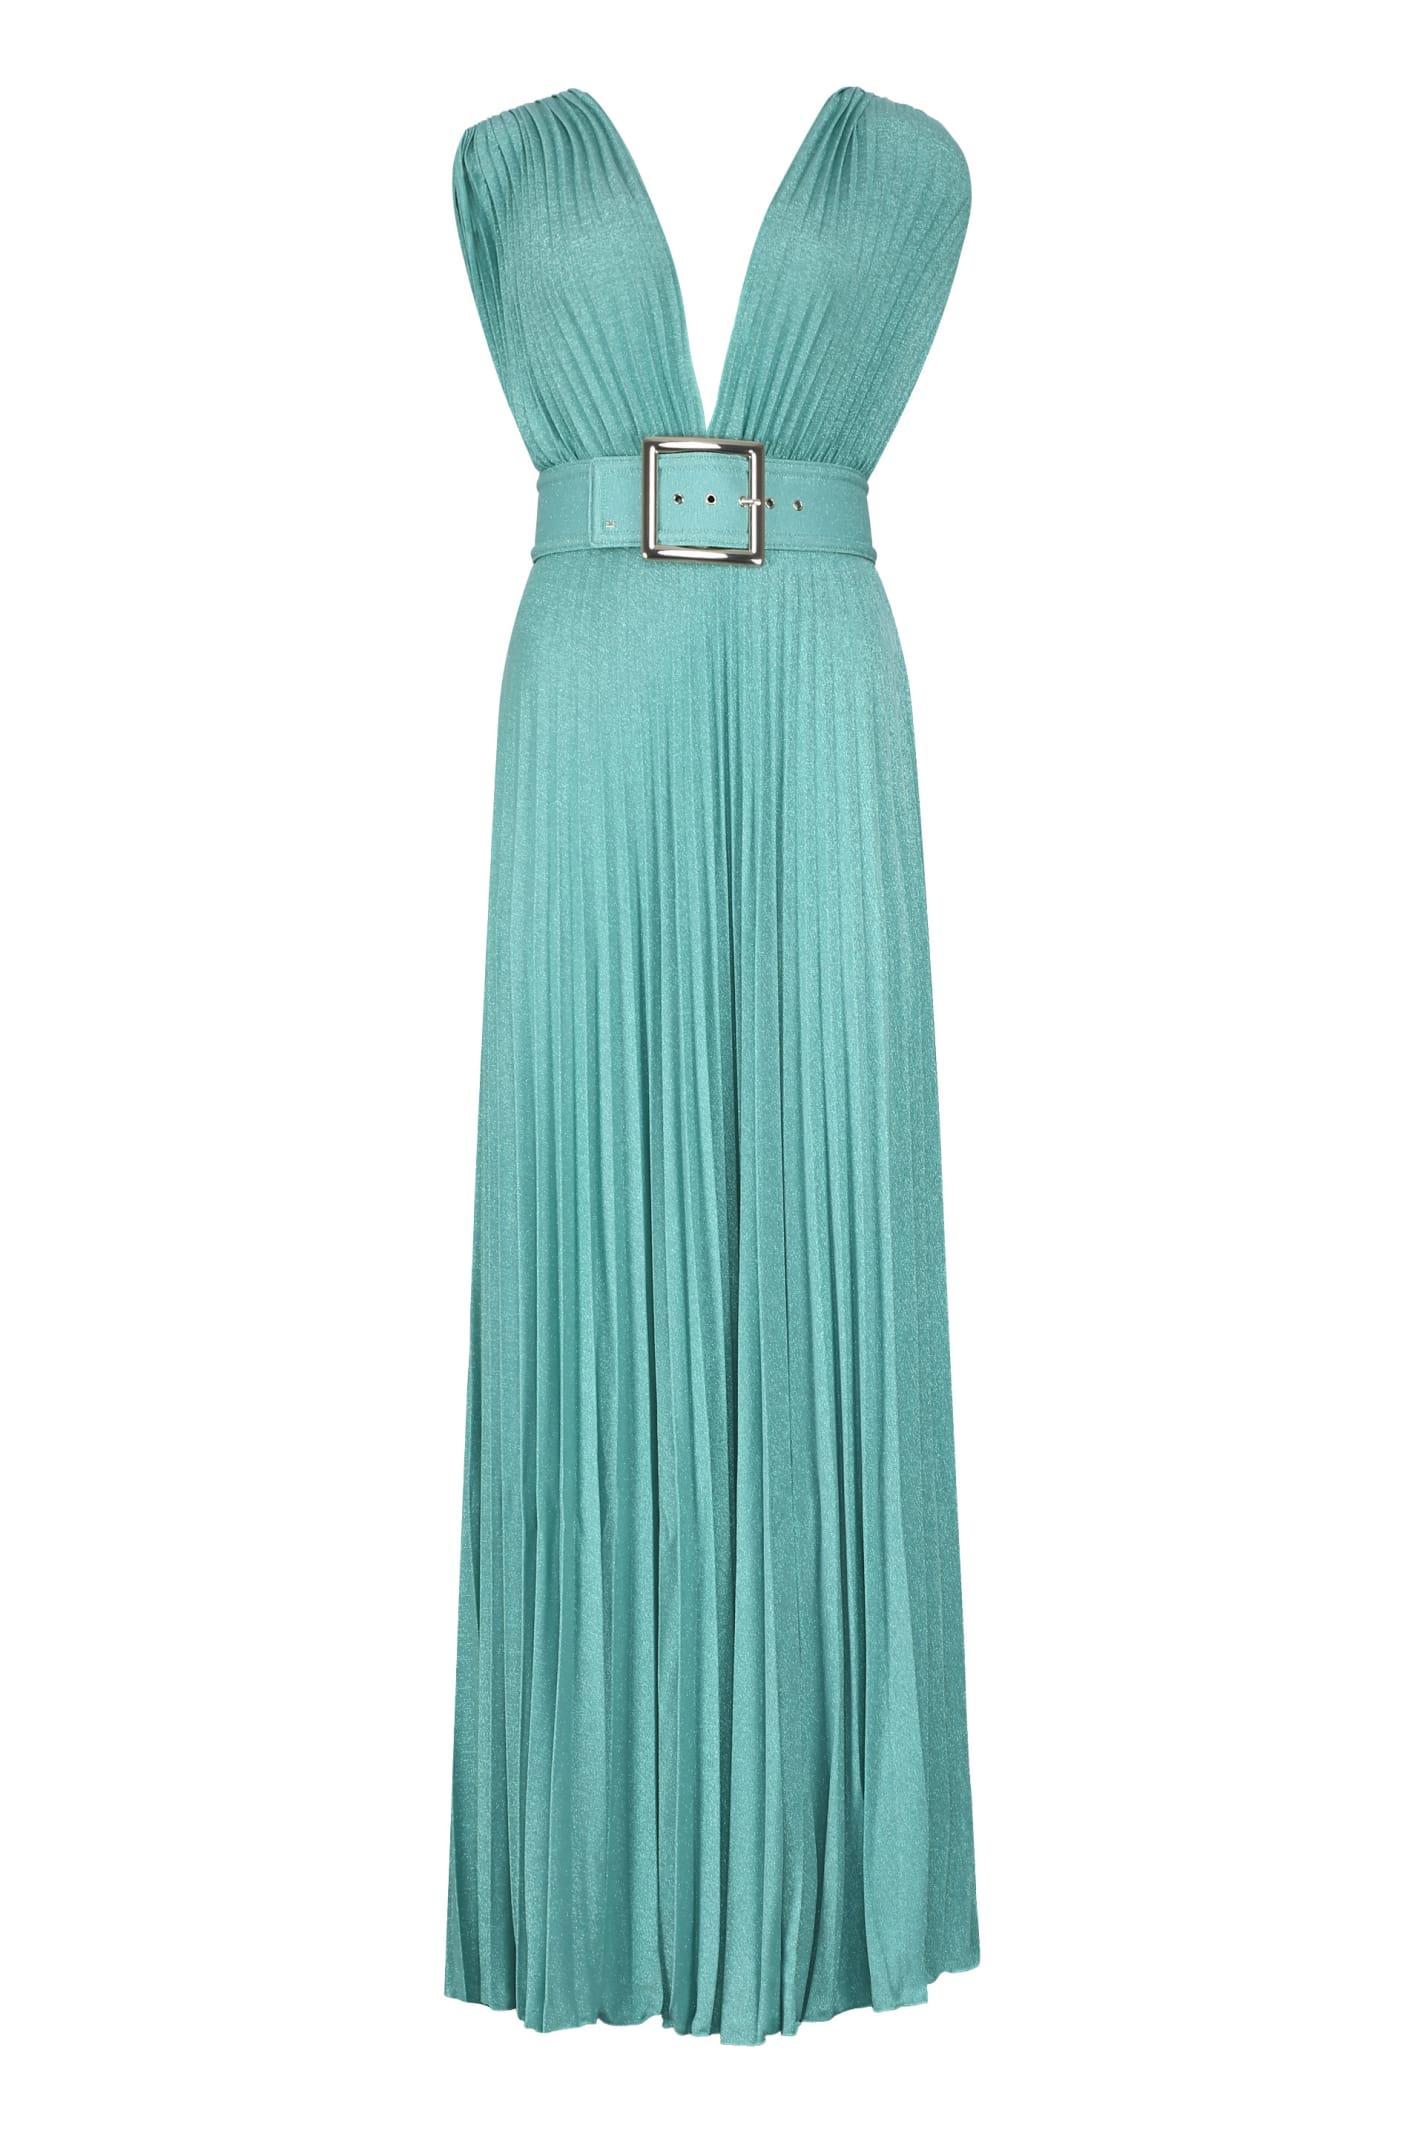 Elisabetta Franchi Lurex Knit Dress